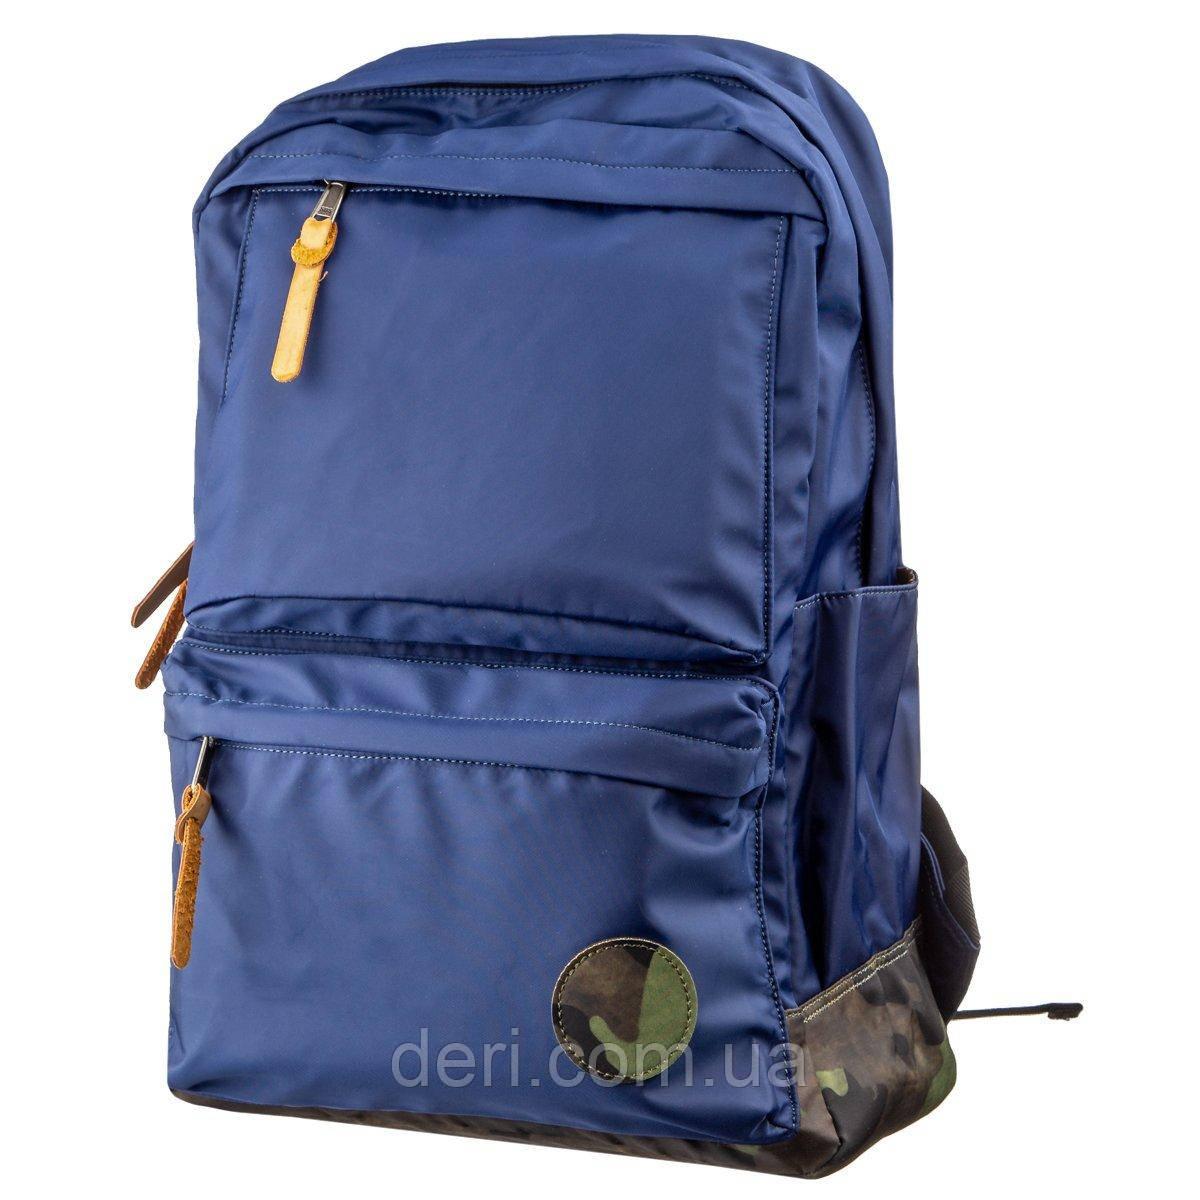 Рюкзак нейлоновый Vintage 14821 Синий, Синий